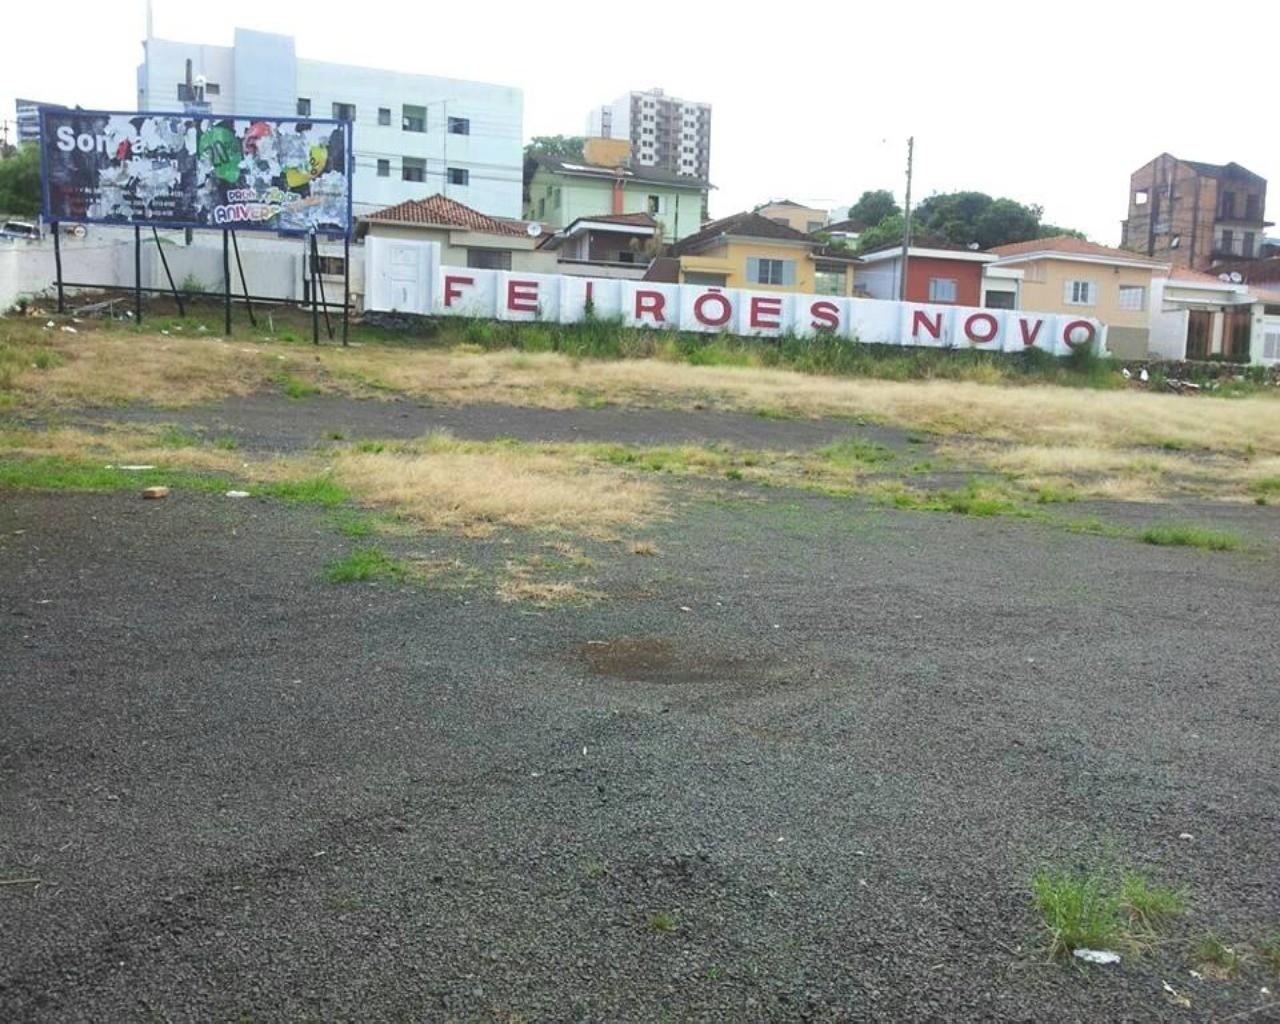 comprar ou alugar área no bairro centro na cidade de franca-sp